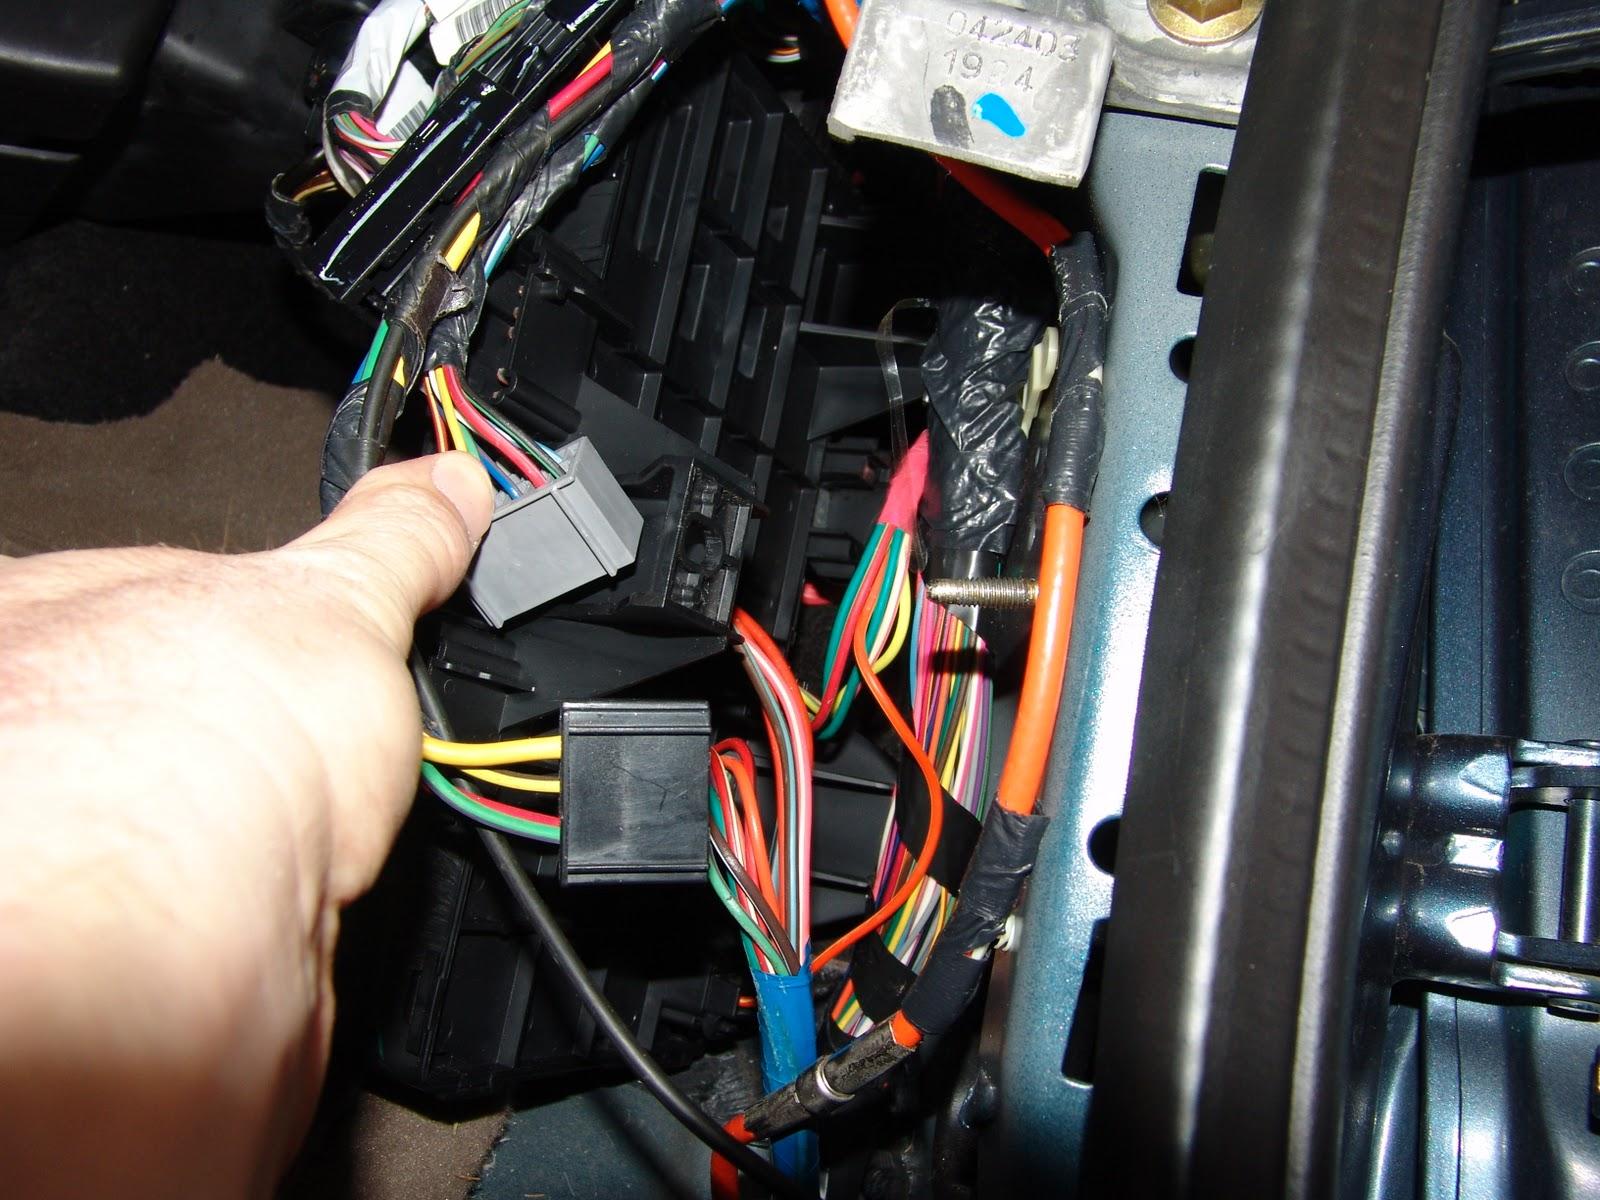 Deh Wiring Harness Diagram 2003 Chevy Suburban Fuse Box Diagram